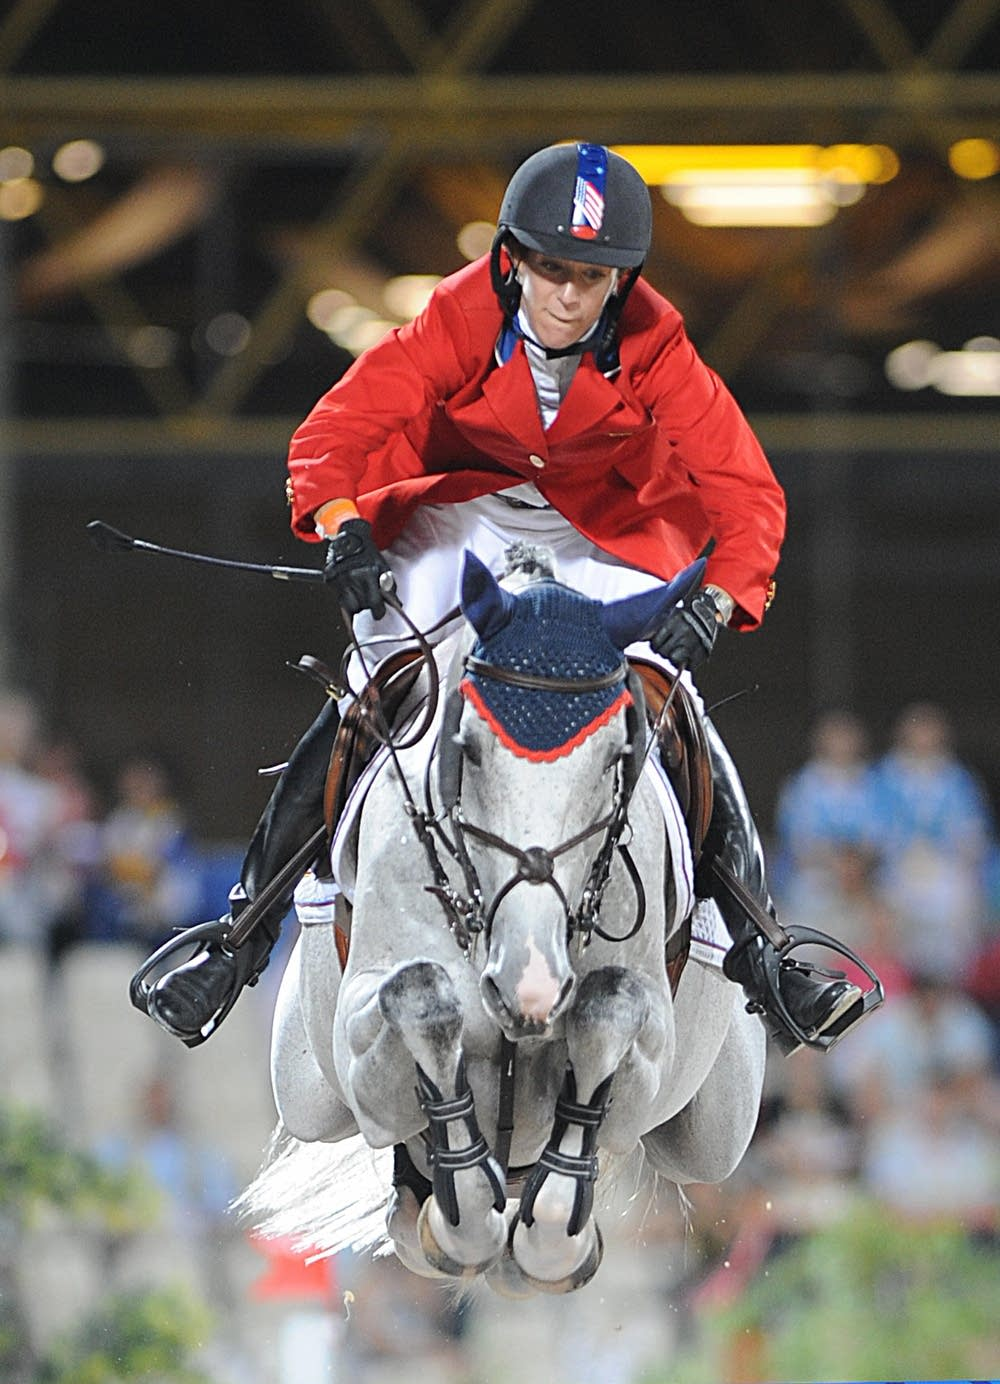 Olympics Day 7 - Equestrian